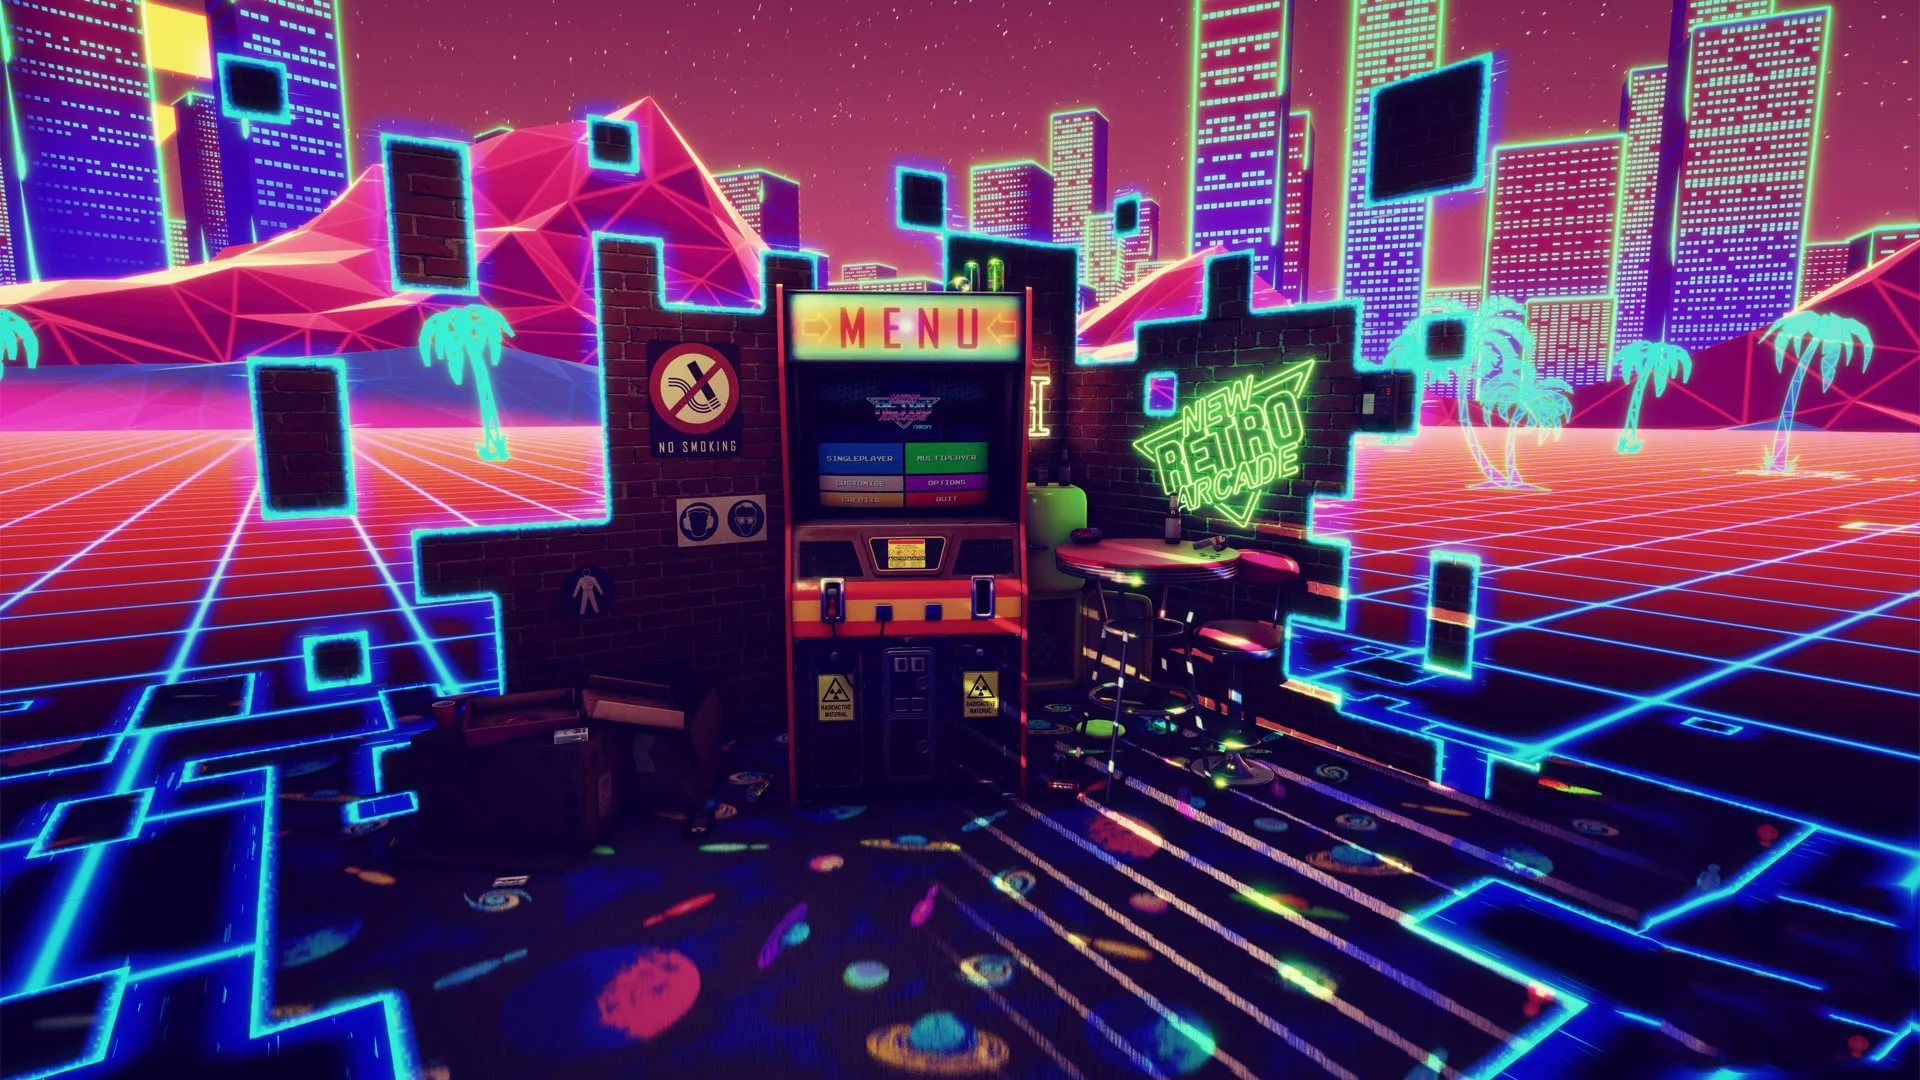 Arcade wallpaper image hd